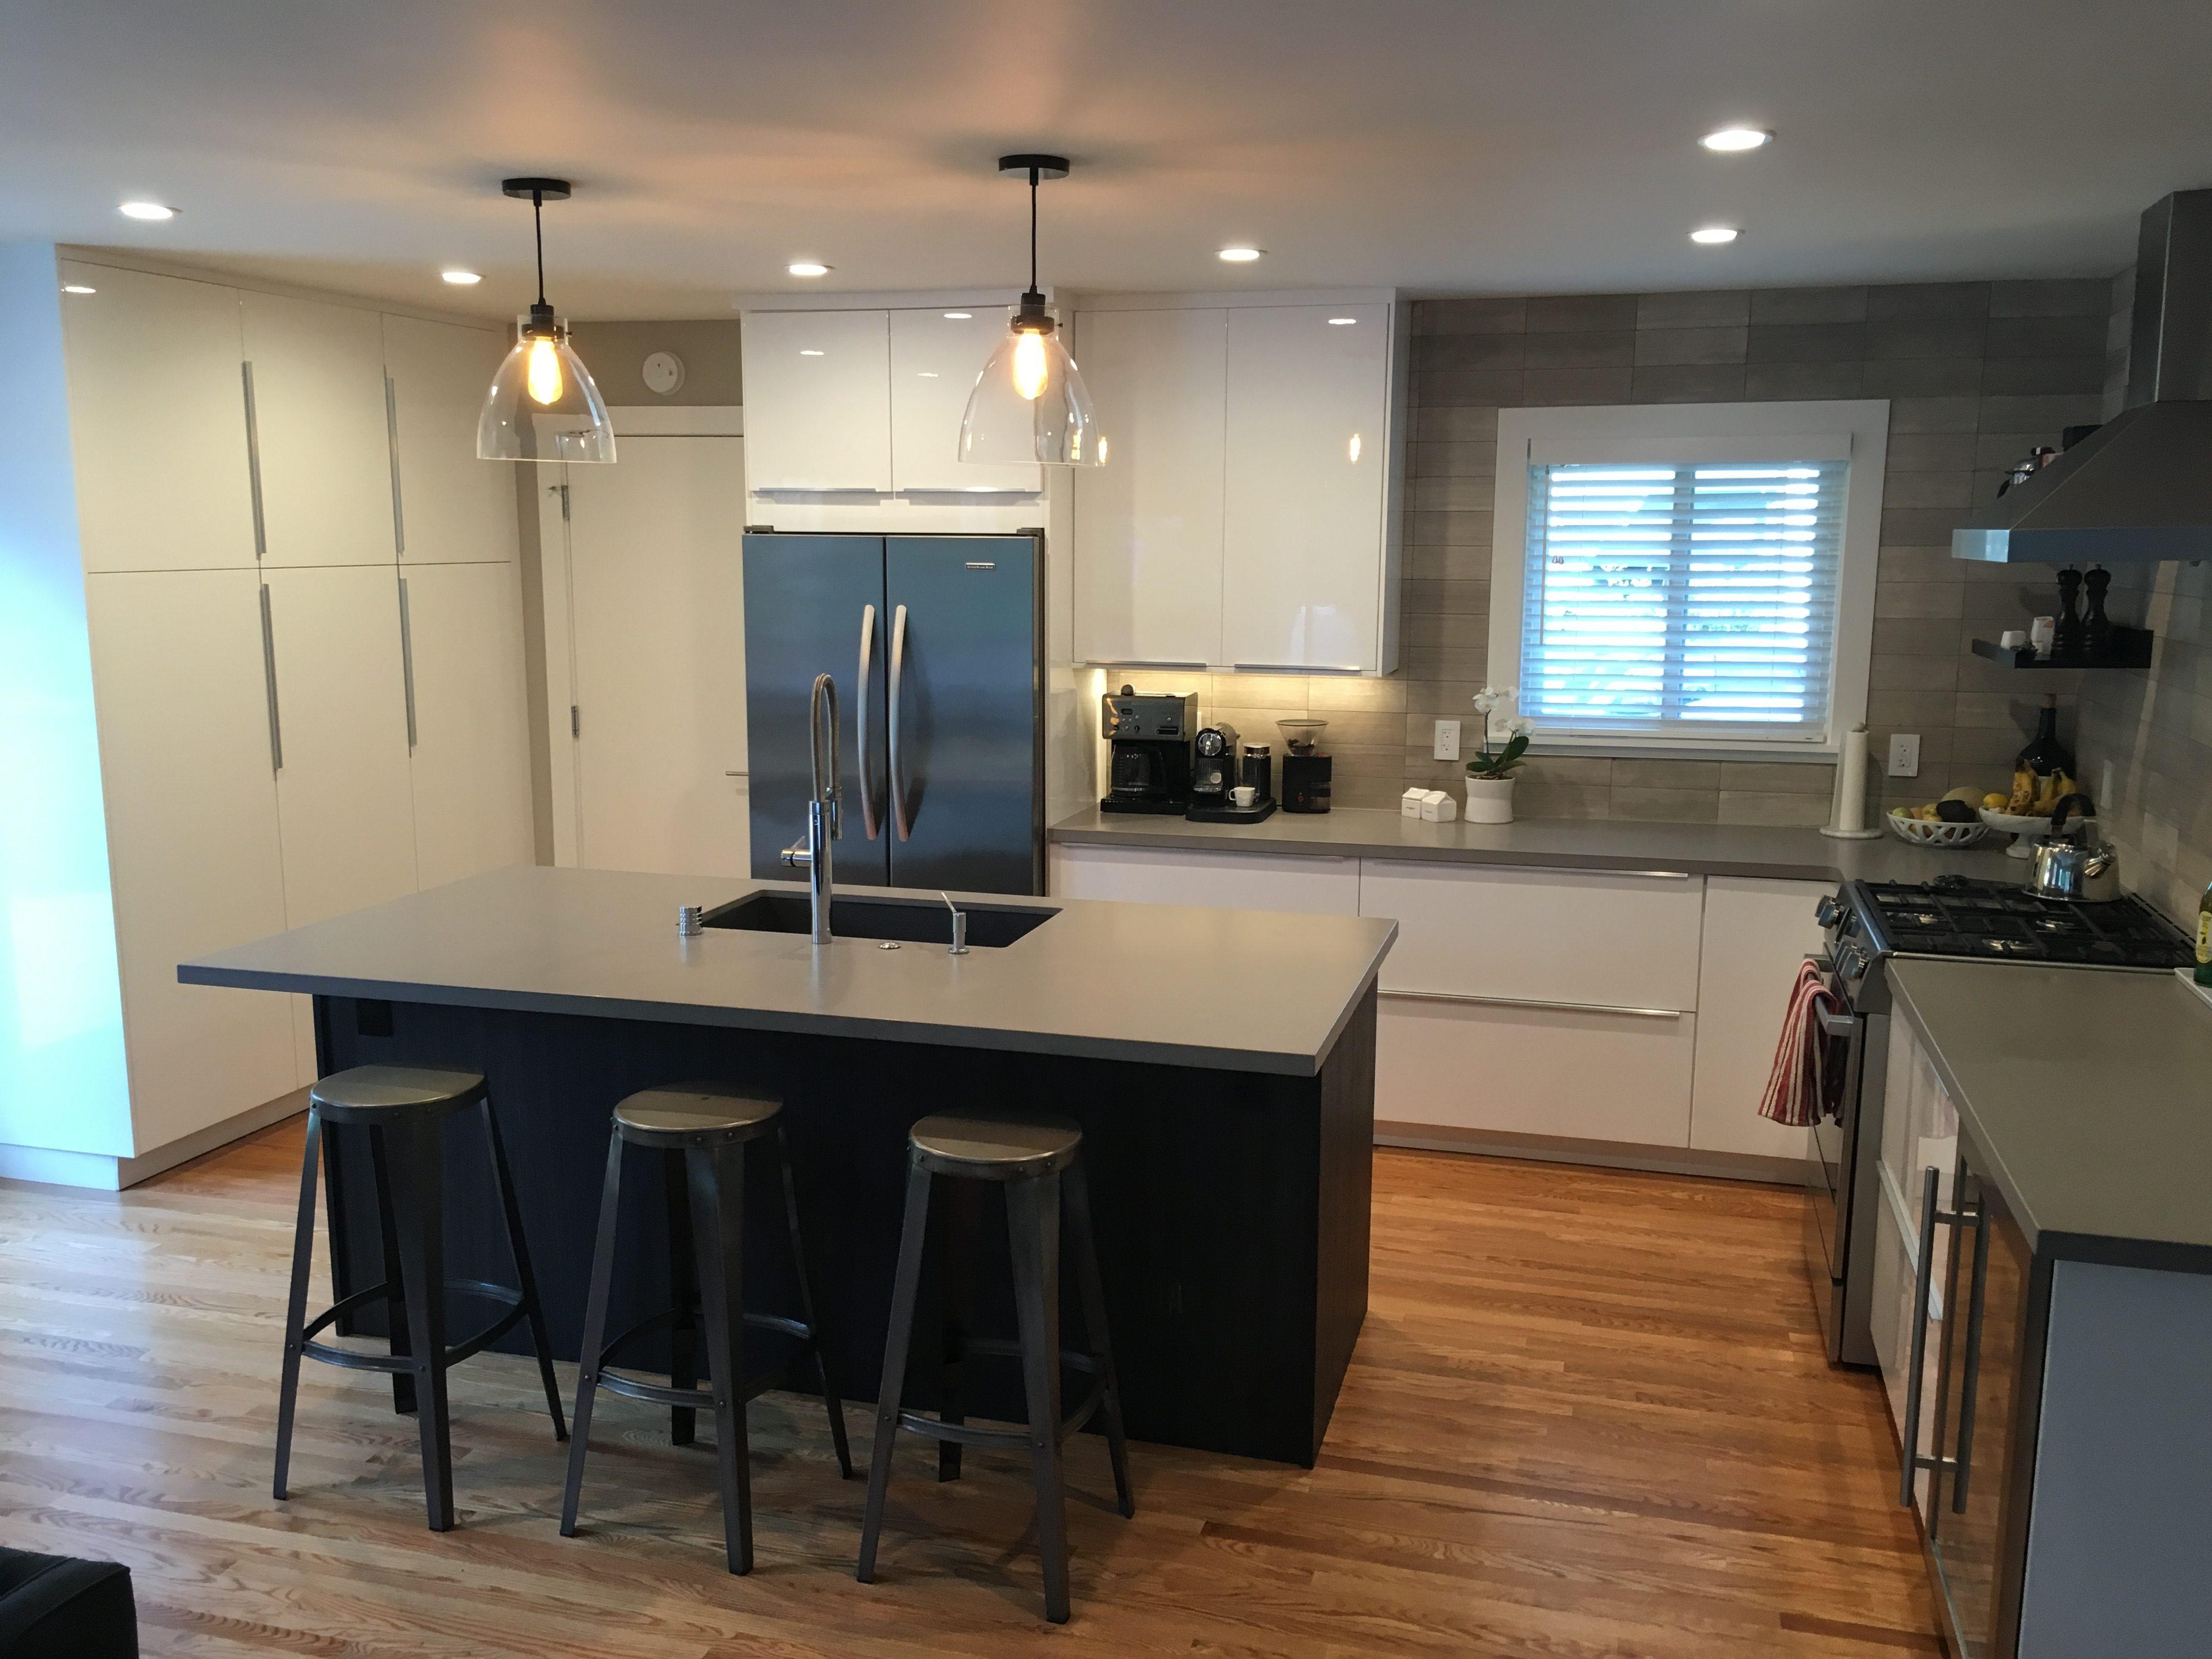 3 light kitchen island pendant vintage decor a sophisticated yet family-friendly ikea design